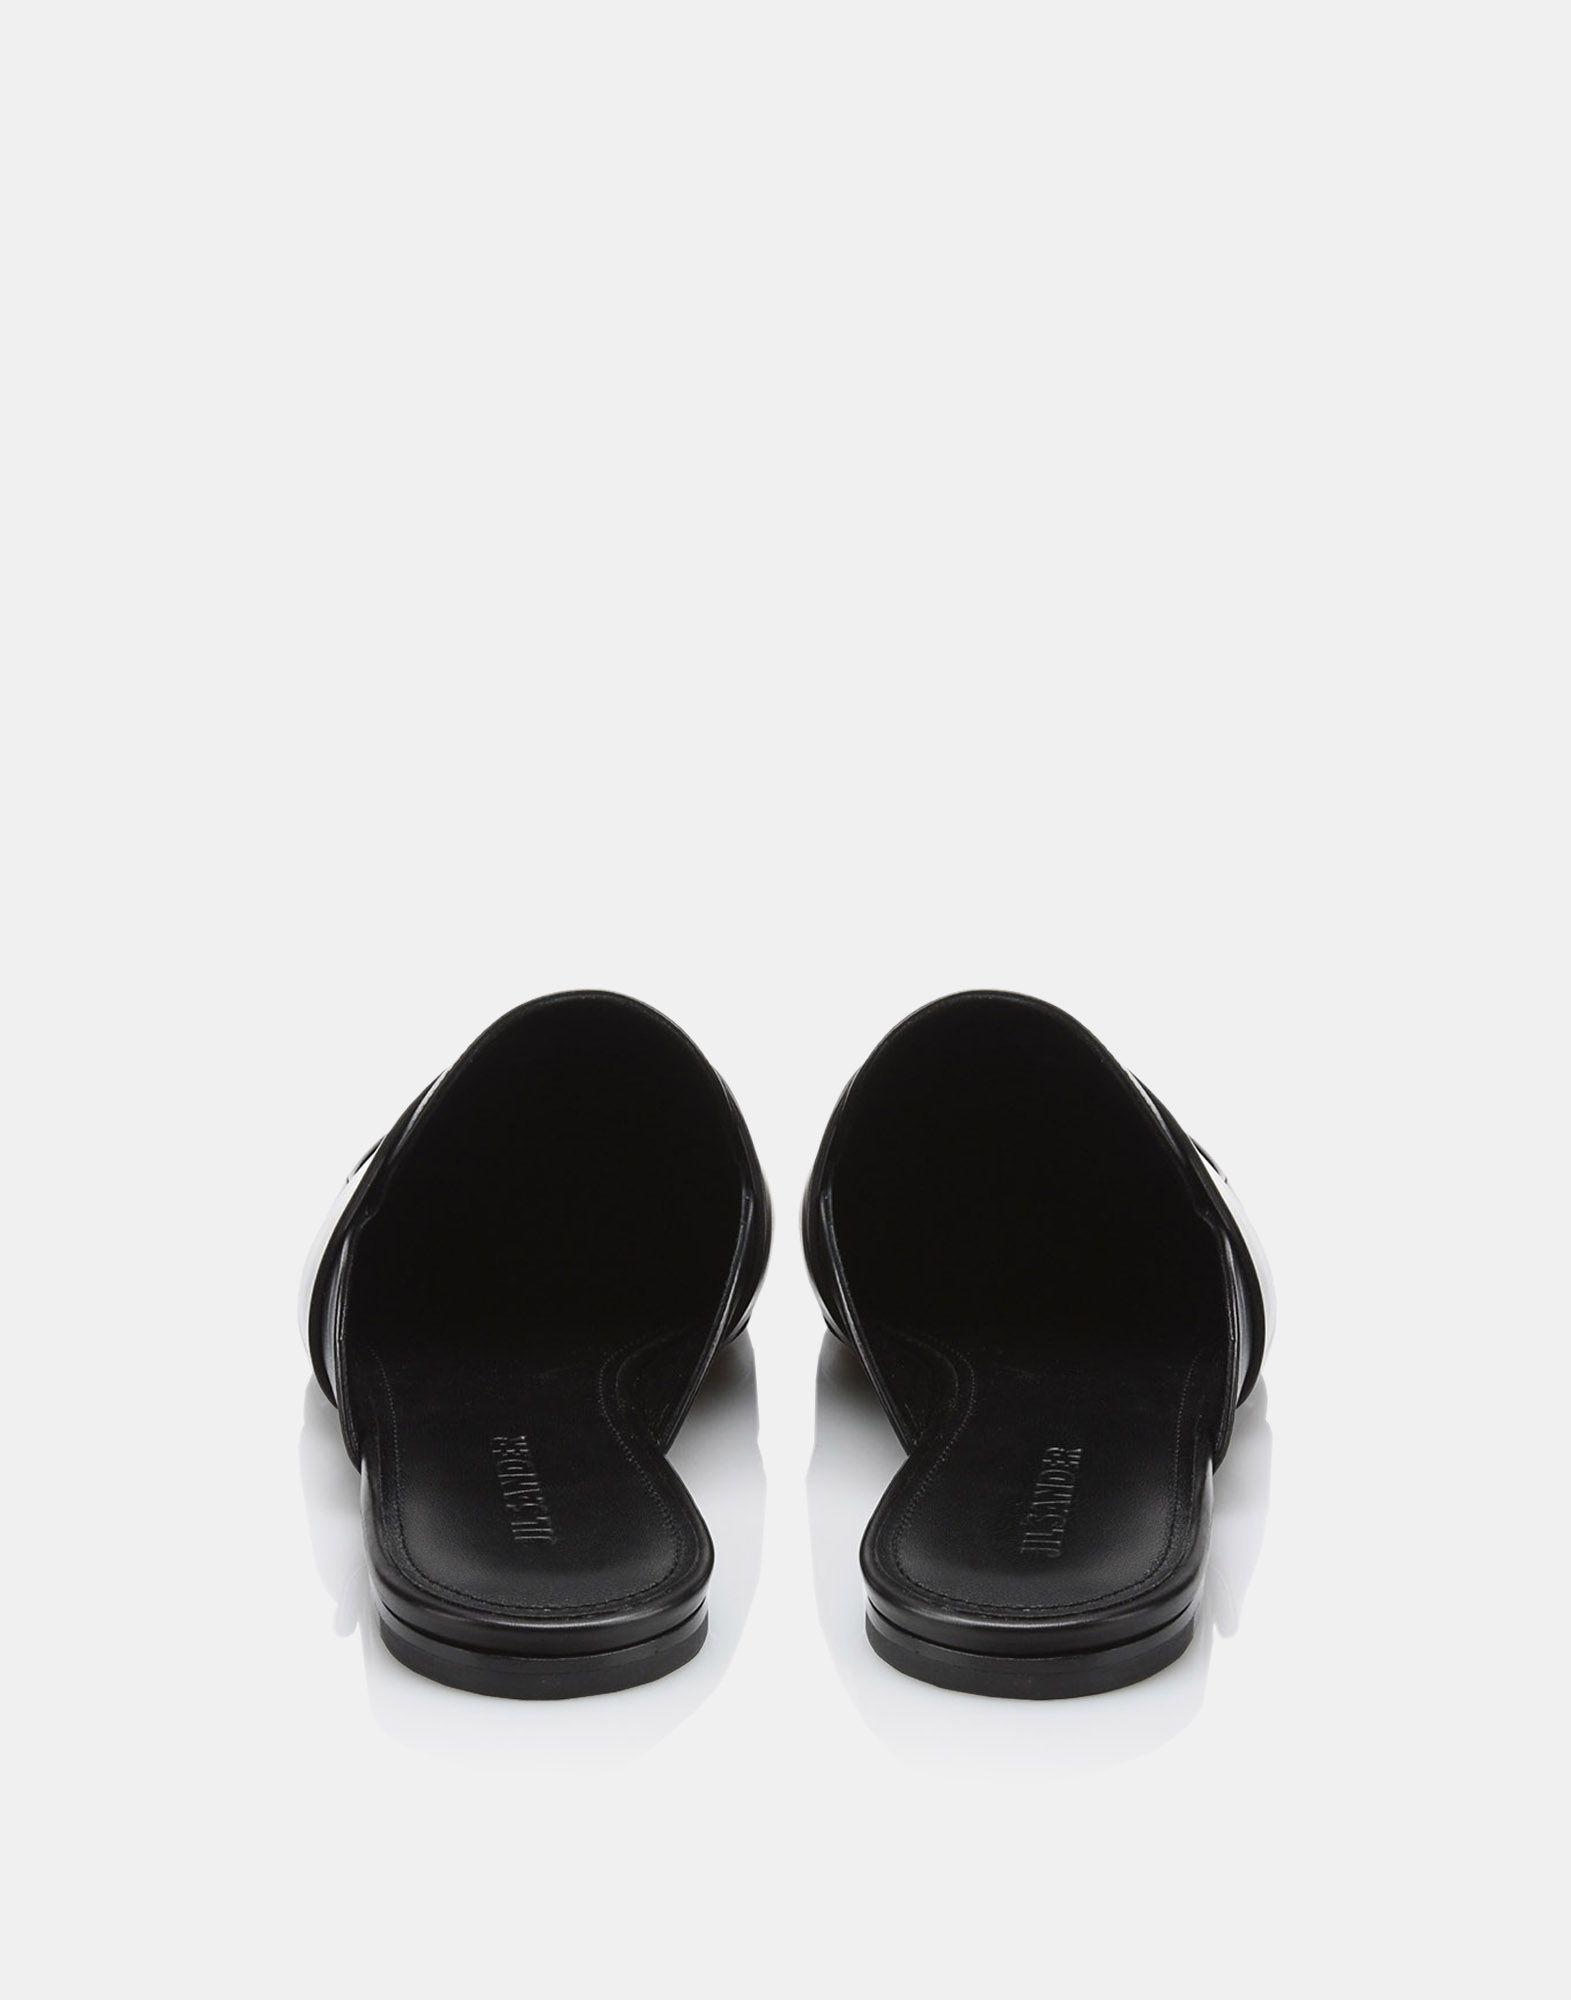 Bootee - JIL SANDER Online Store